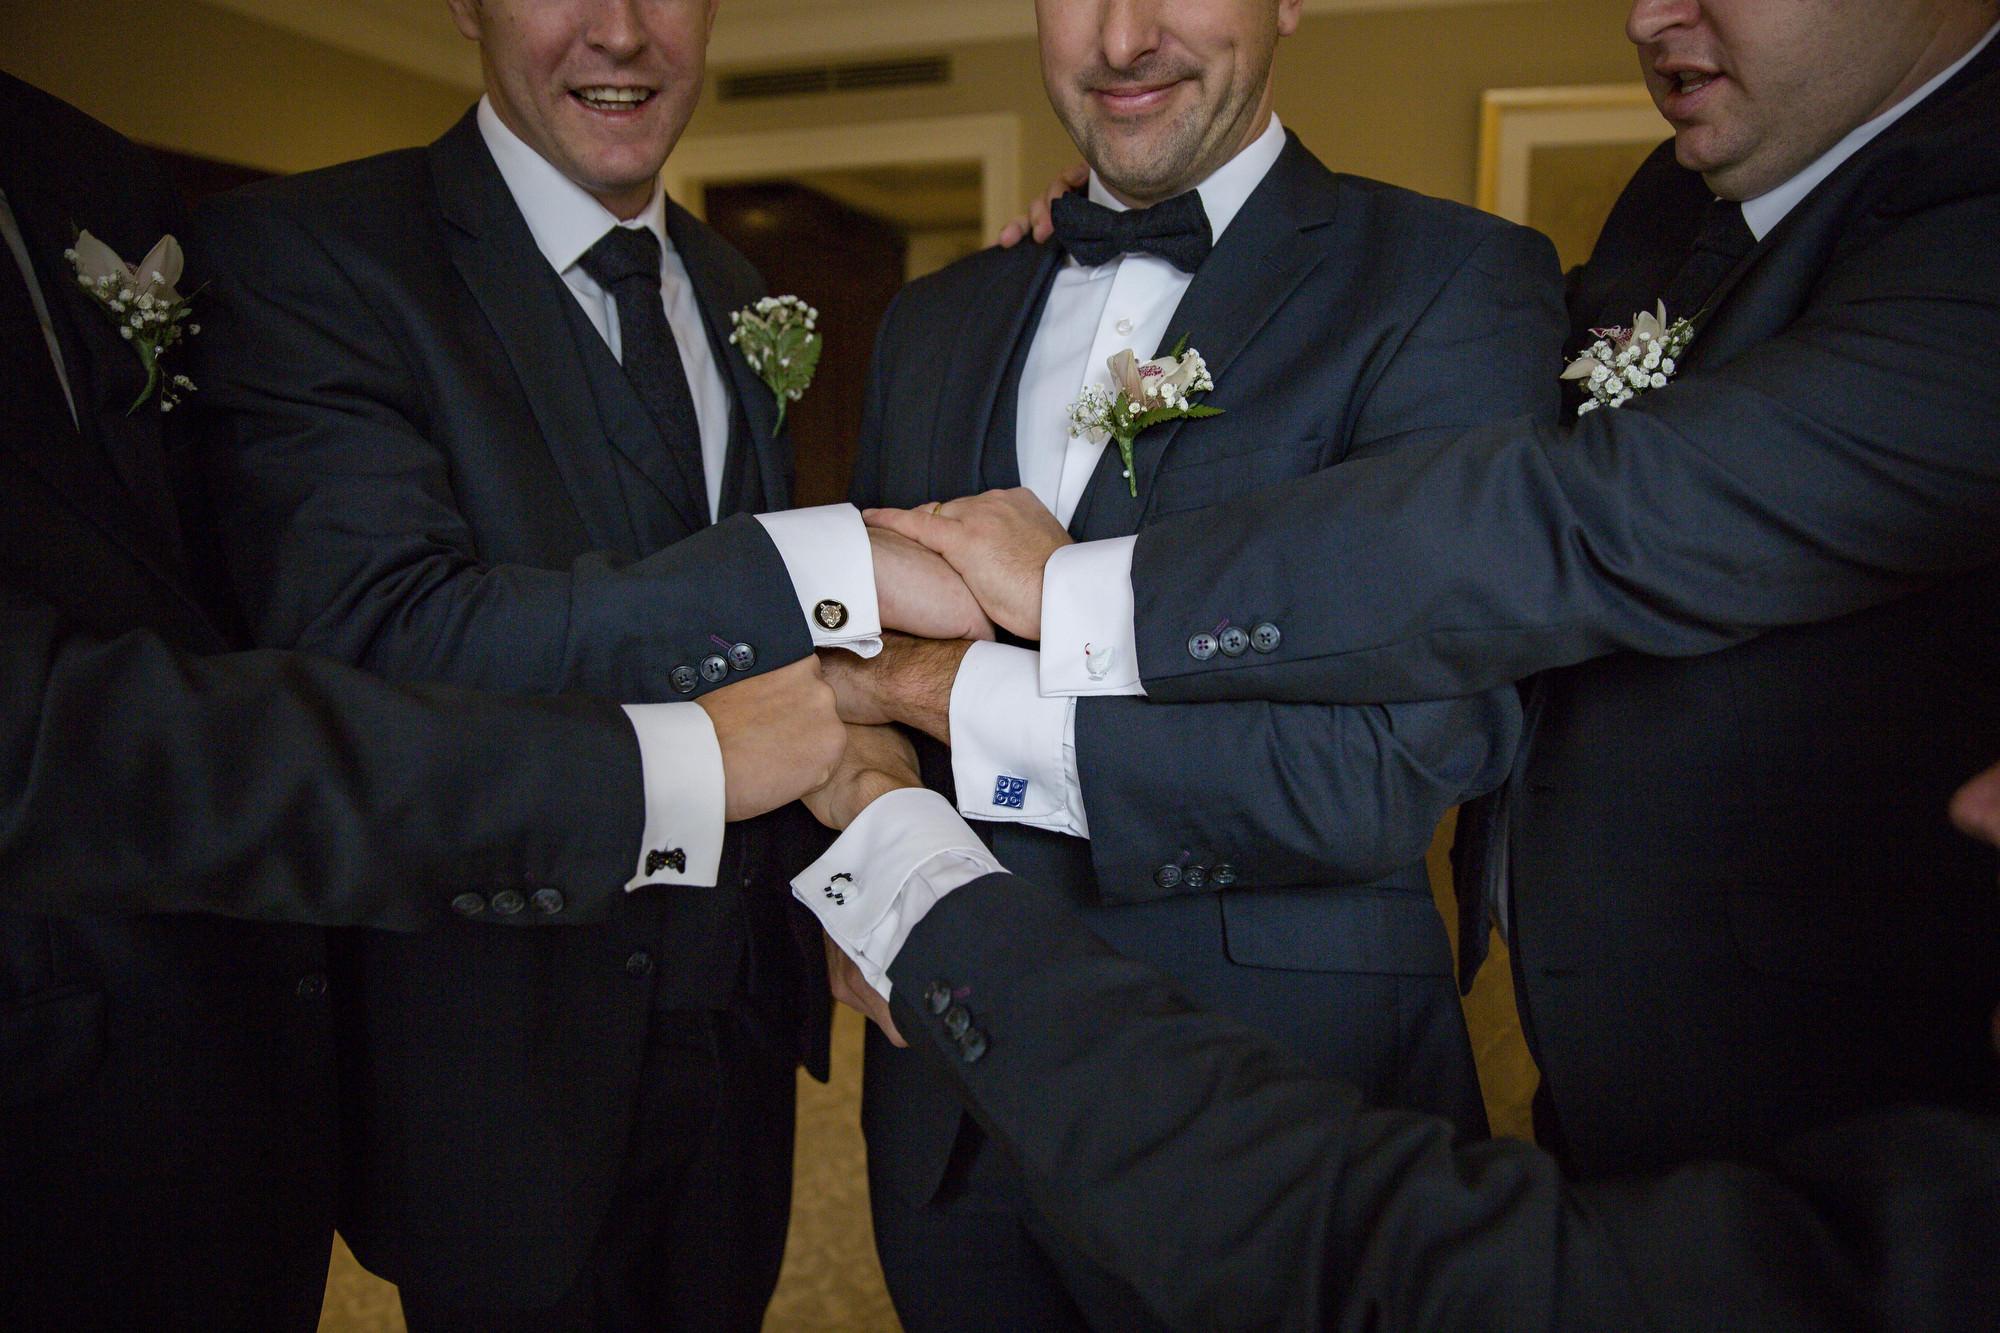 muckross_park_hotel_grougane_barra_wedding_photographer_goldenmoments_014.jpg